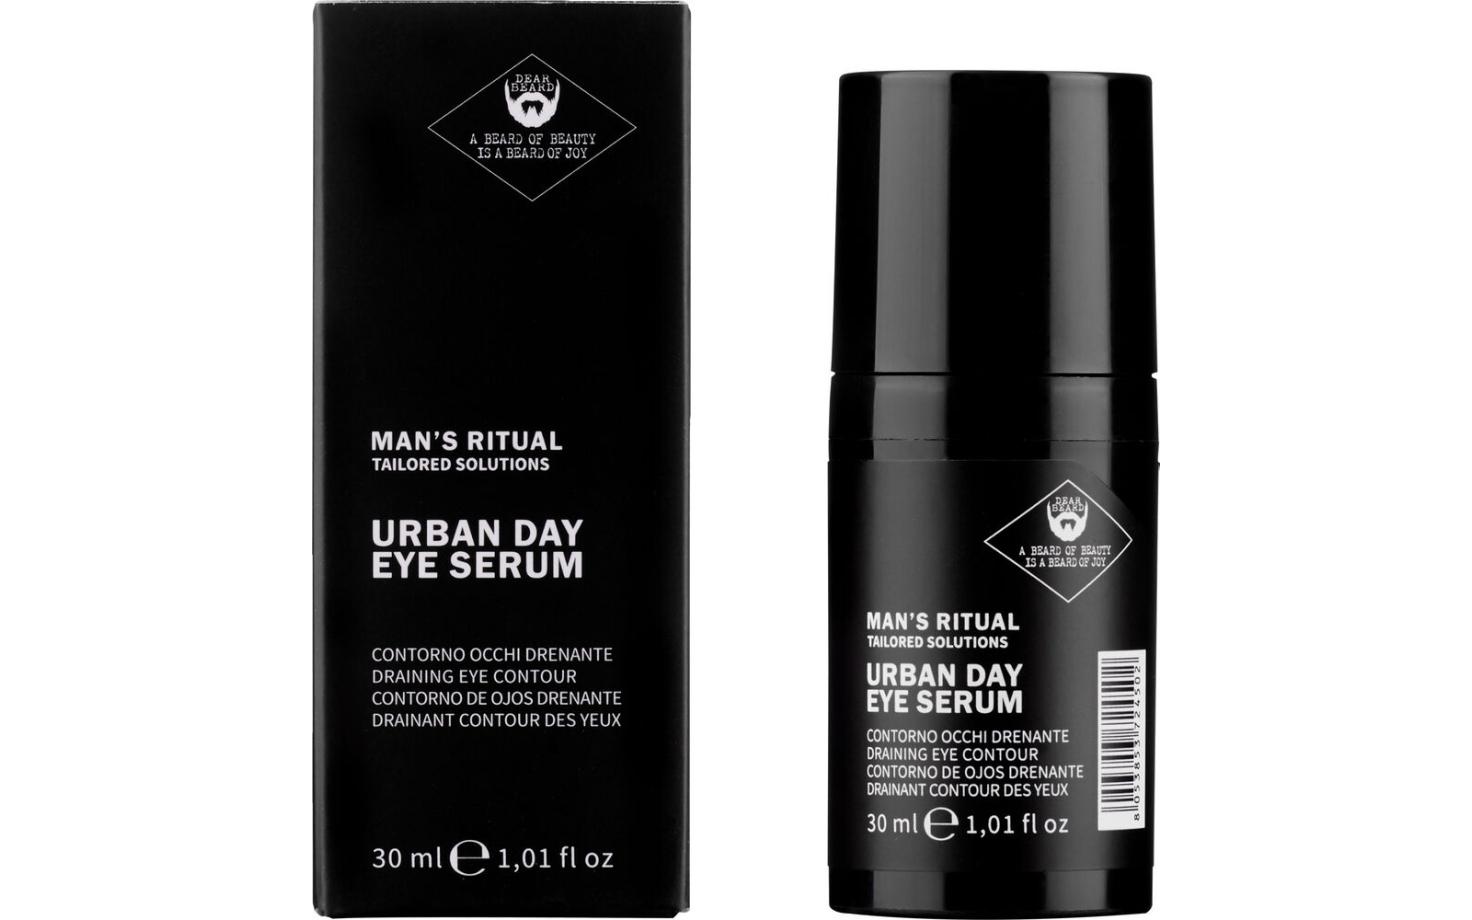 Dear Beard Man's Ritual Urban Day Eye Serum 30 ml